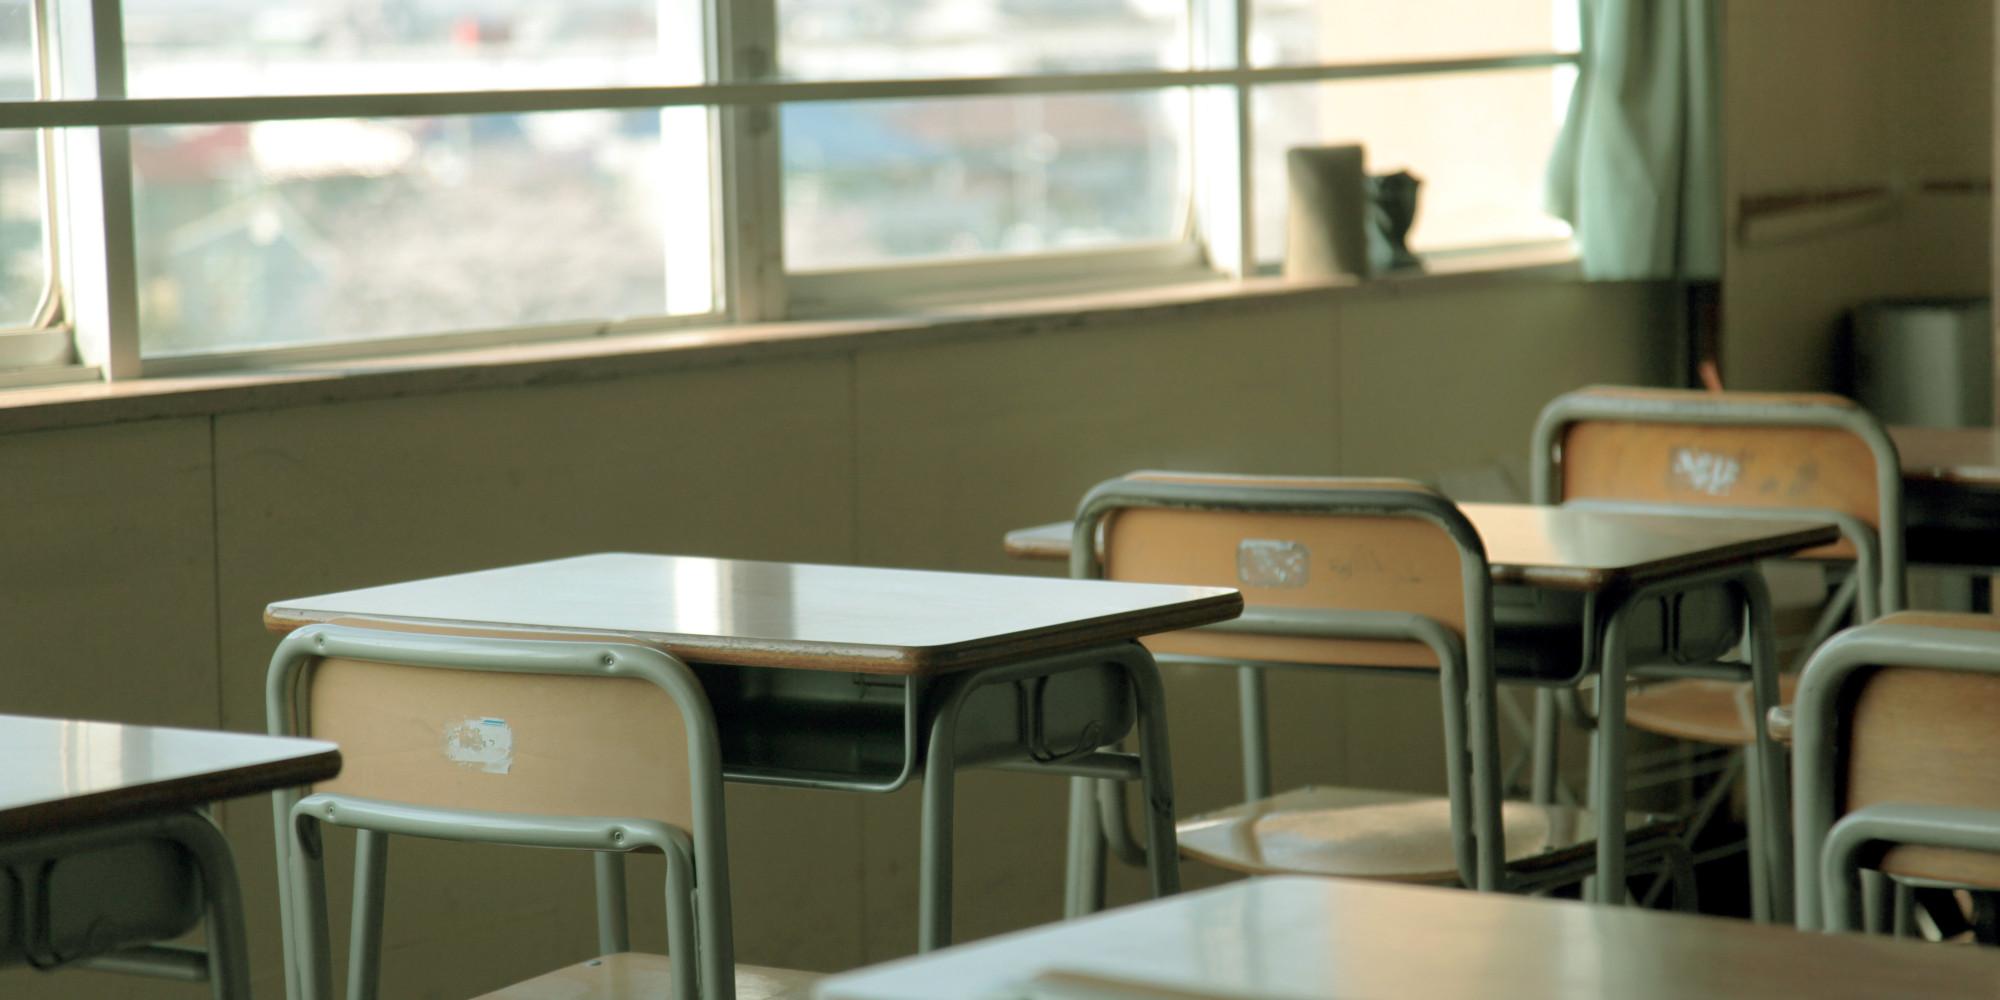 Cozy reading corner | Teacher classroom, Reading classroom ...  |Classroom